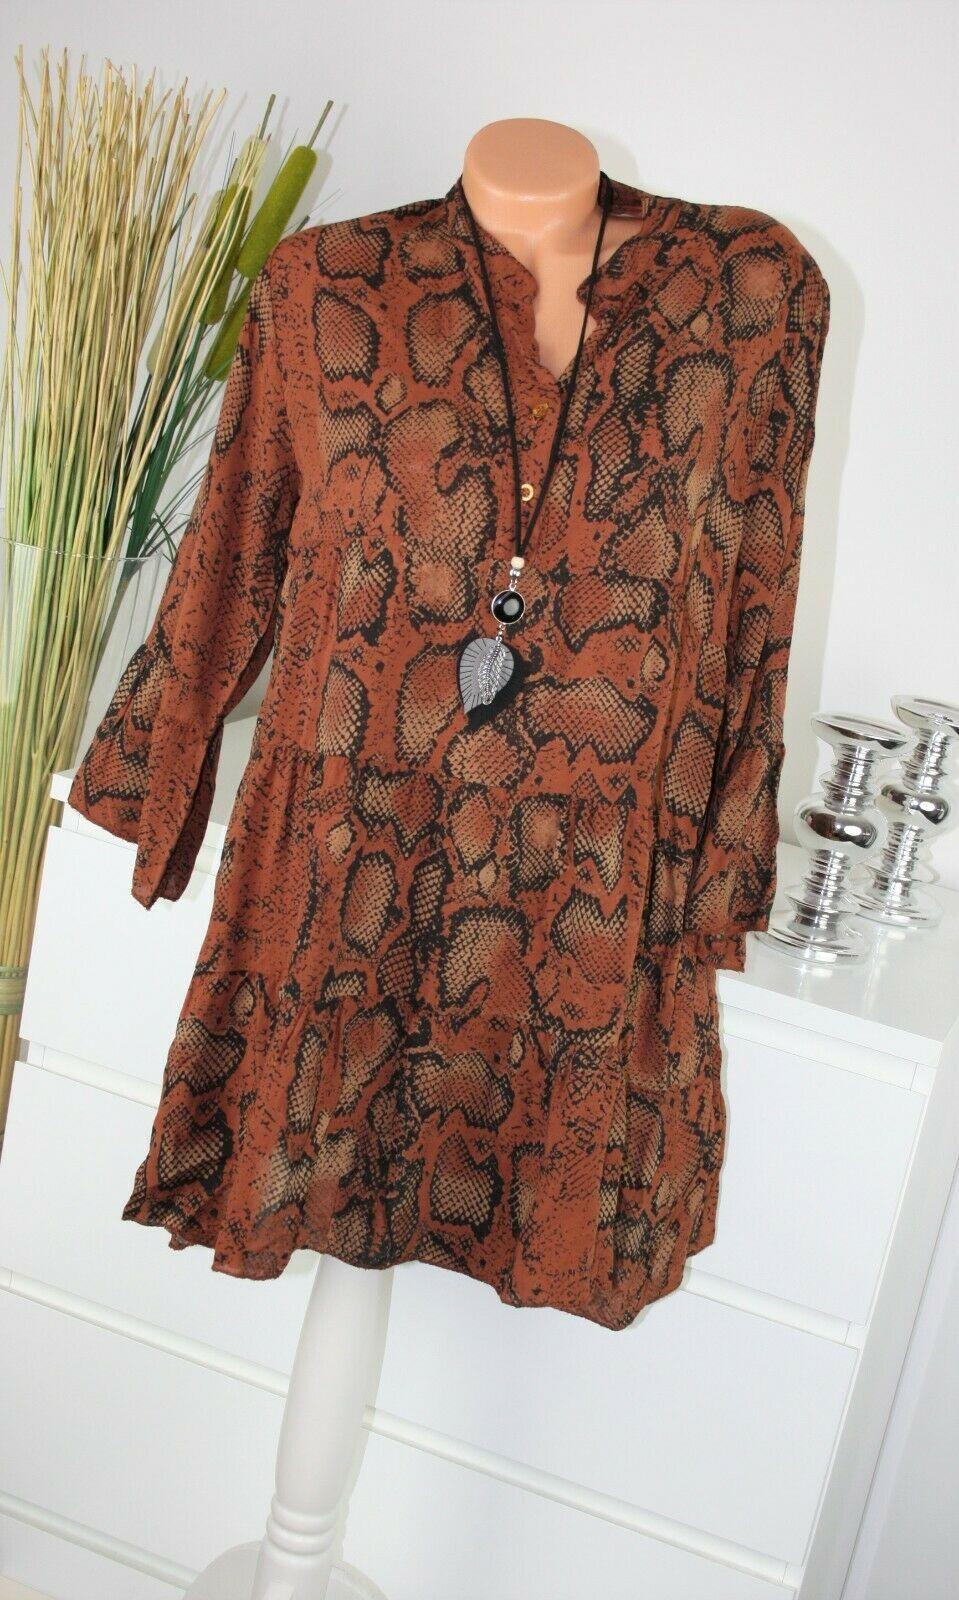 italy moda kleid reptil motiv kurz dress top shirt bluse